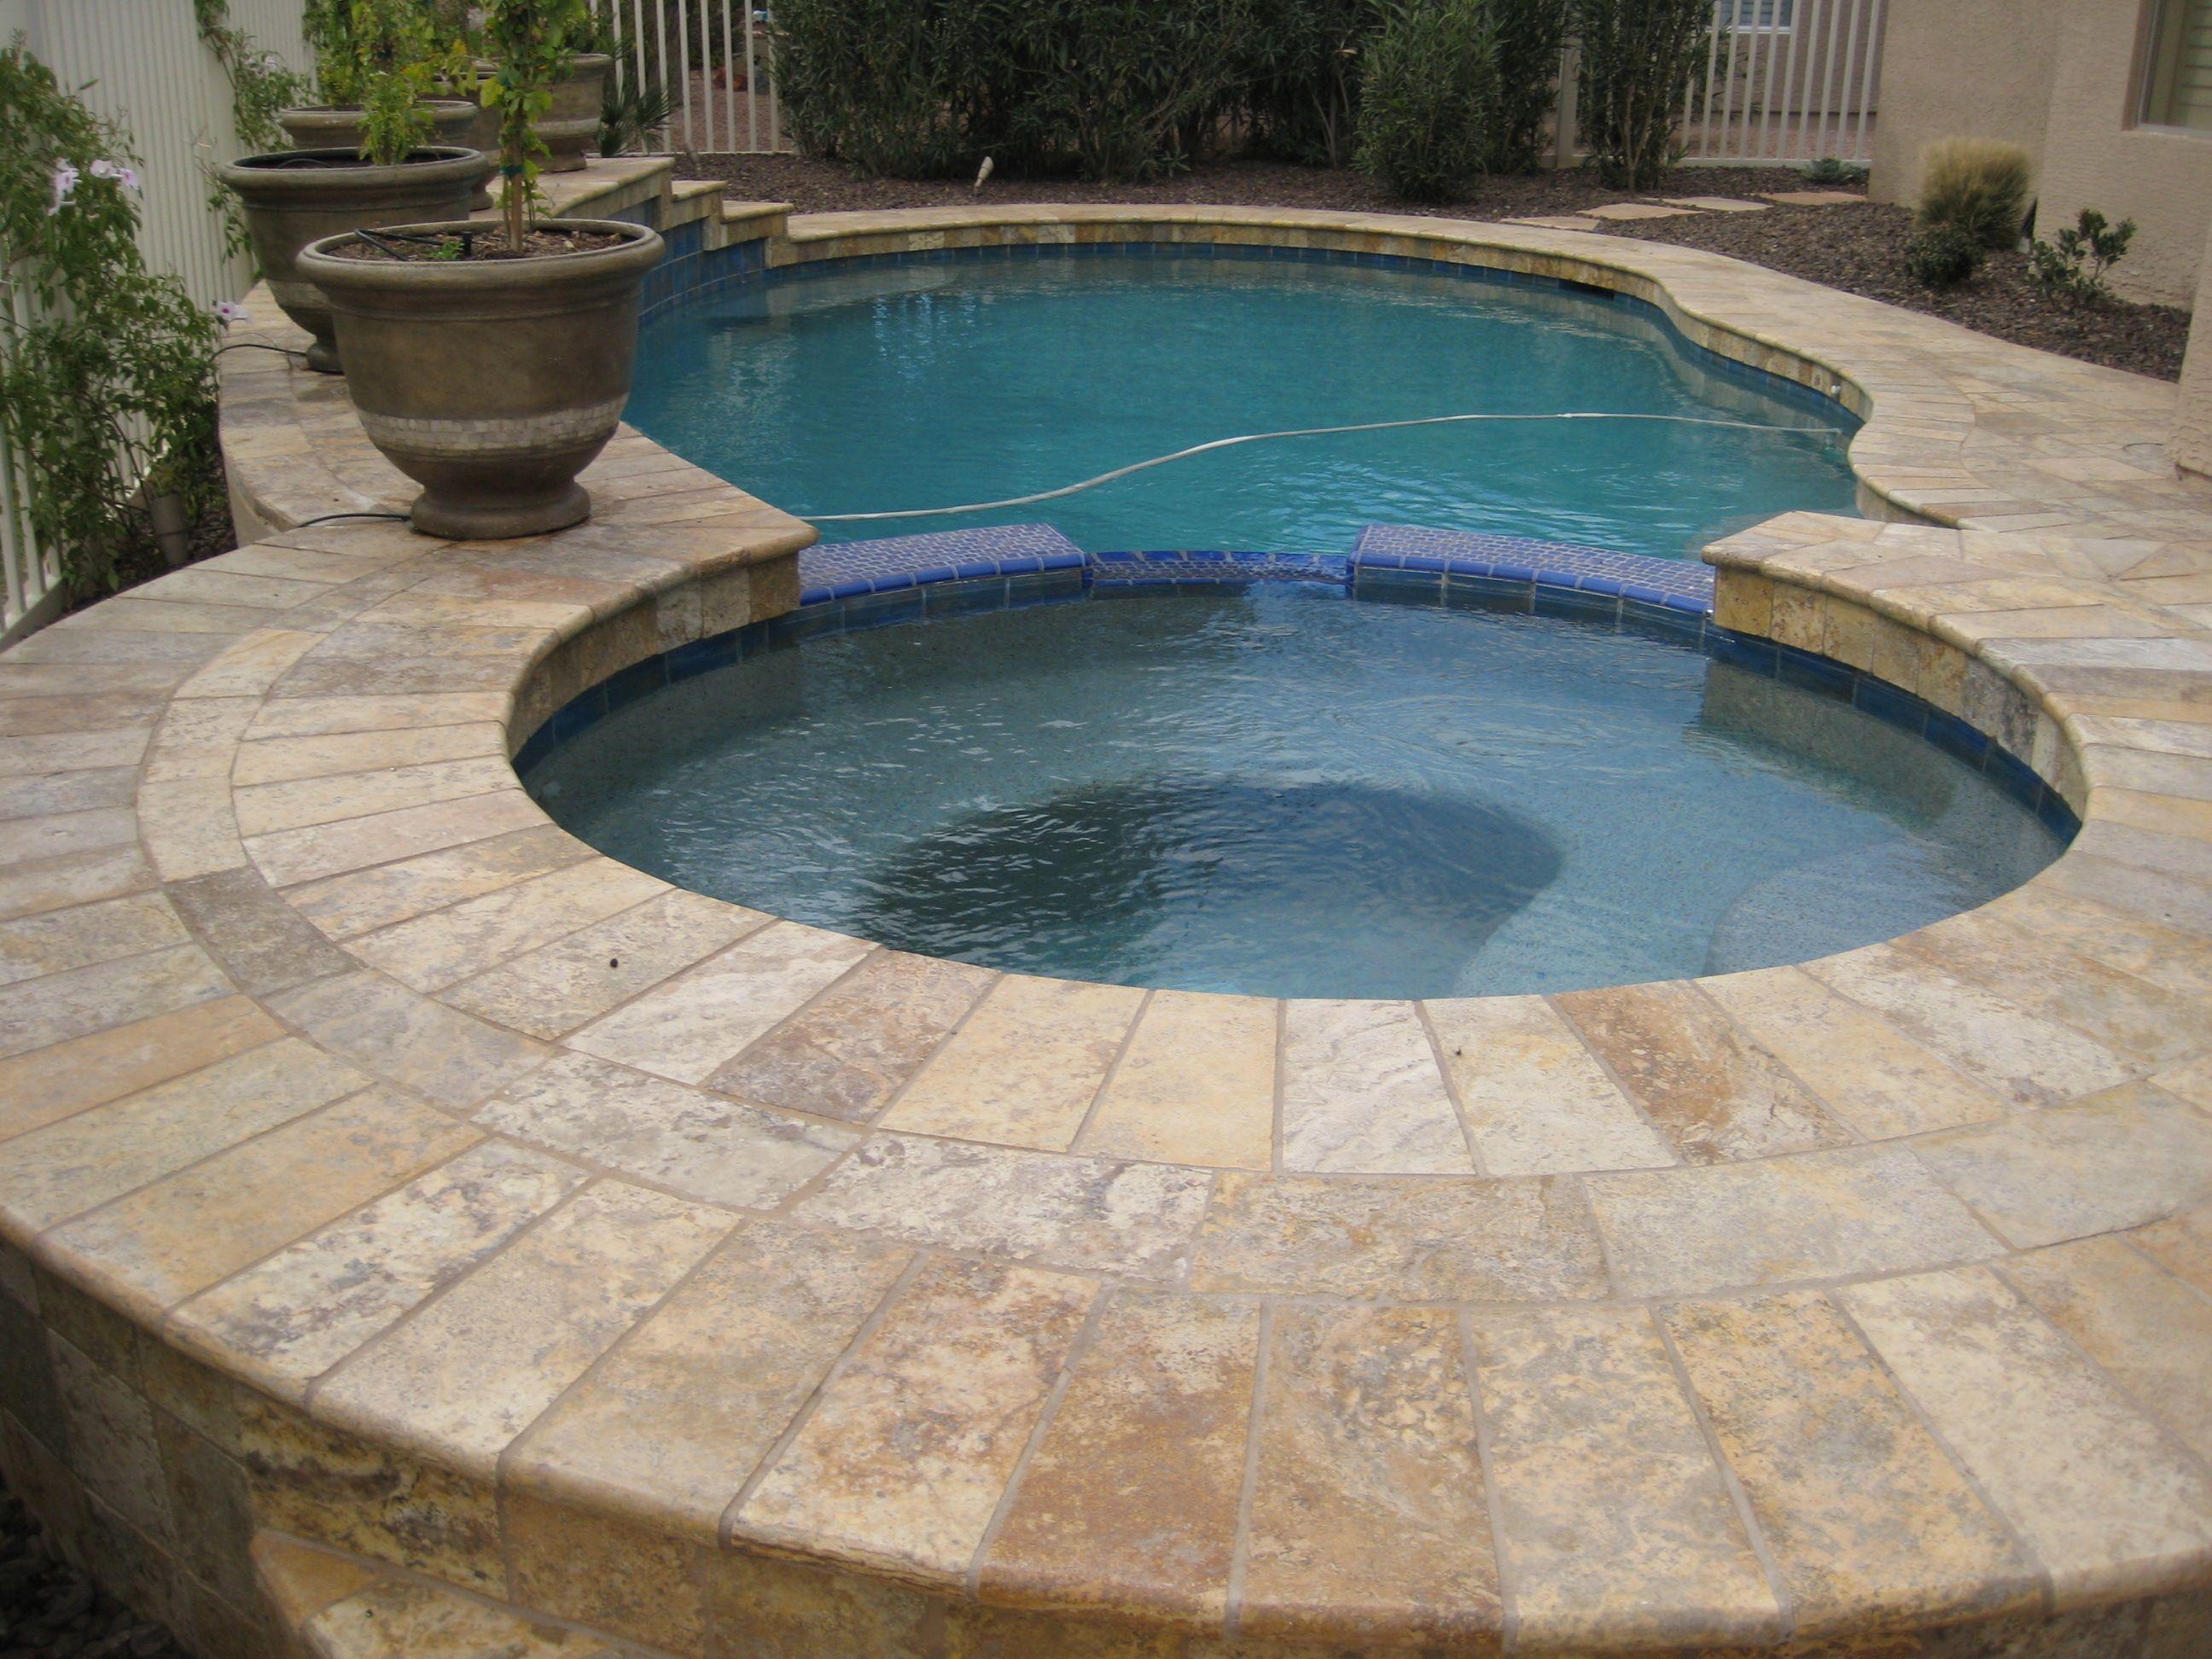 Outside Hardscapes | Hardscapes U0026 Pools | Outside Living Concepts